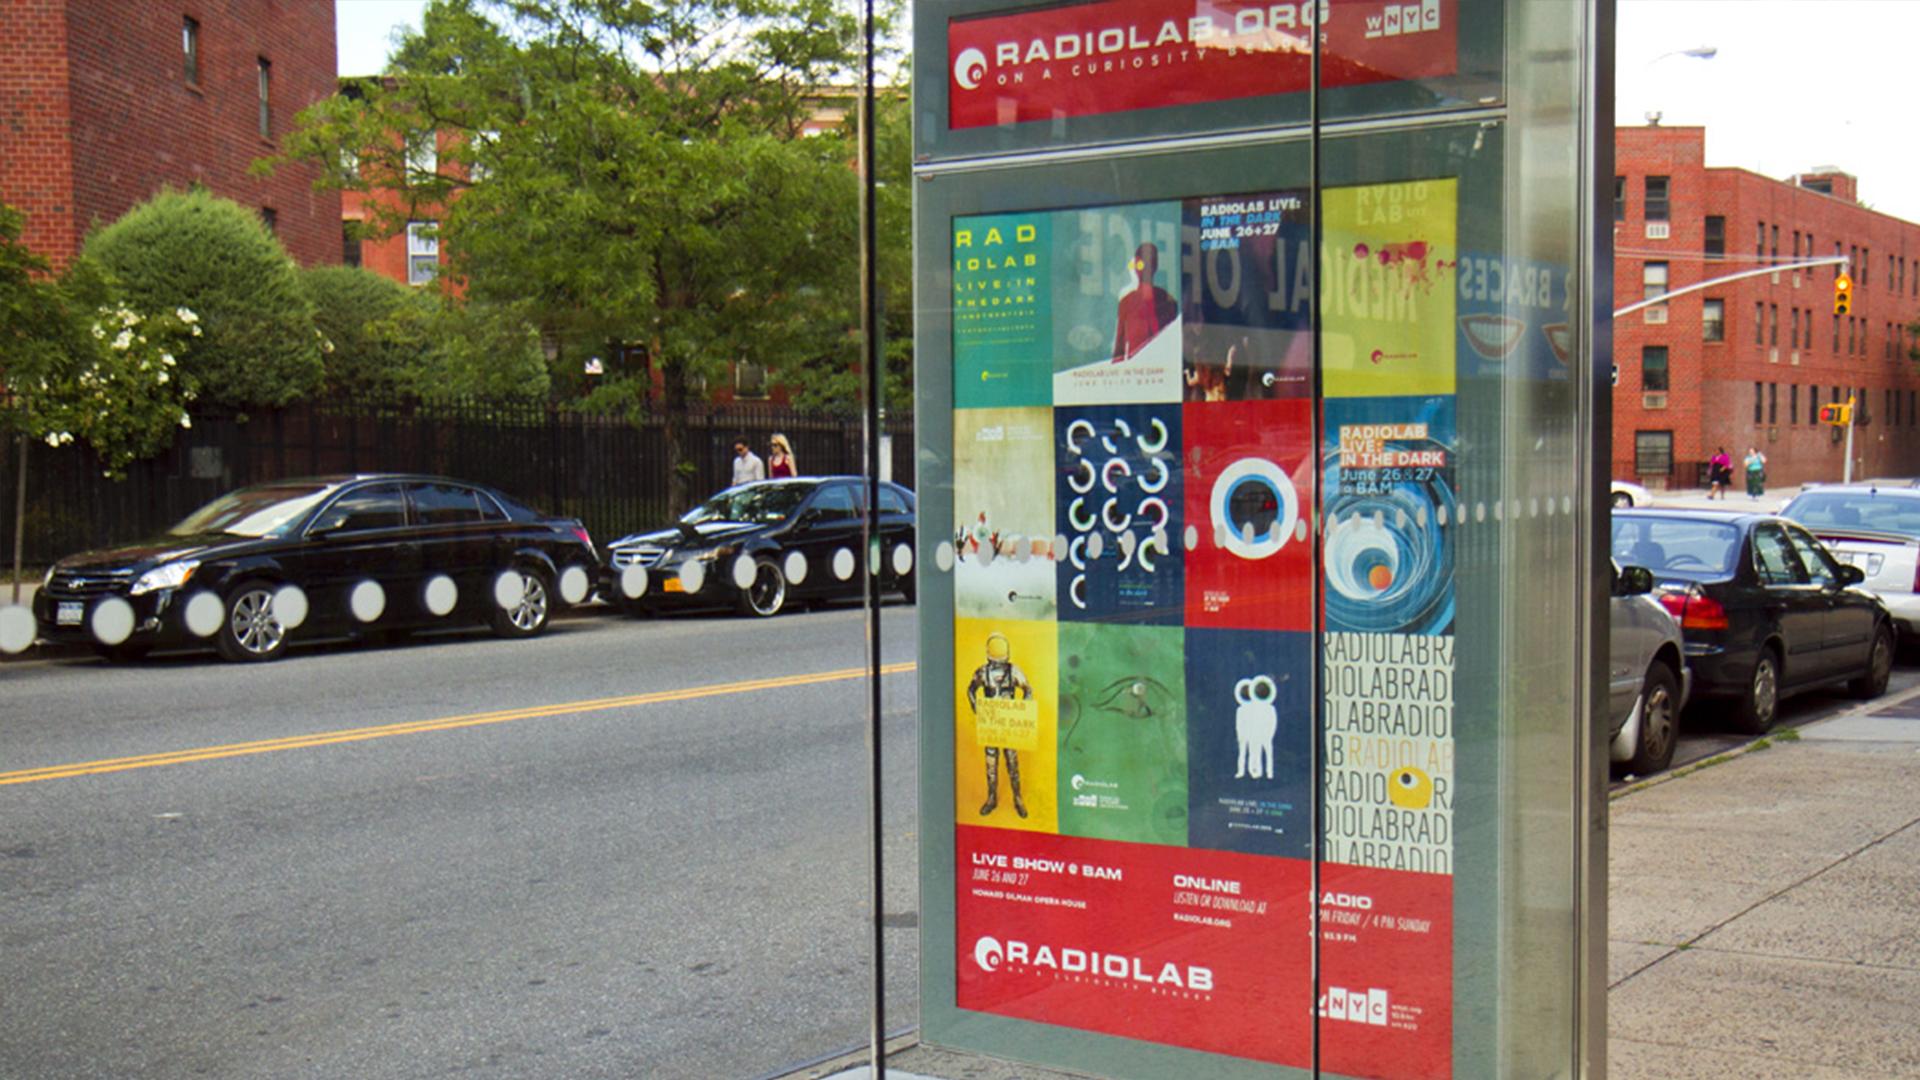 WNYC Radiolab posters bus shelter